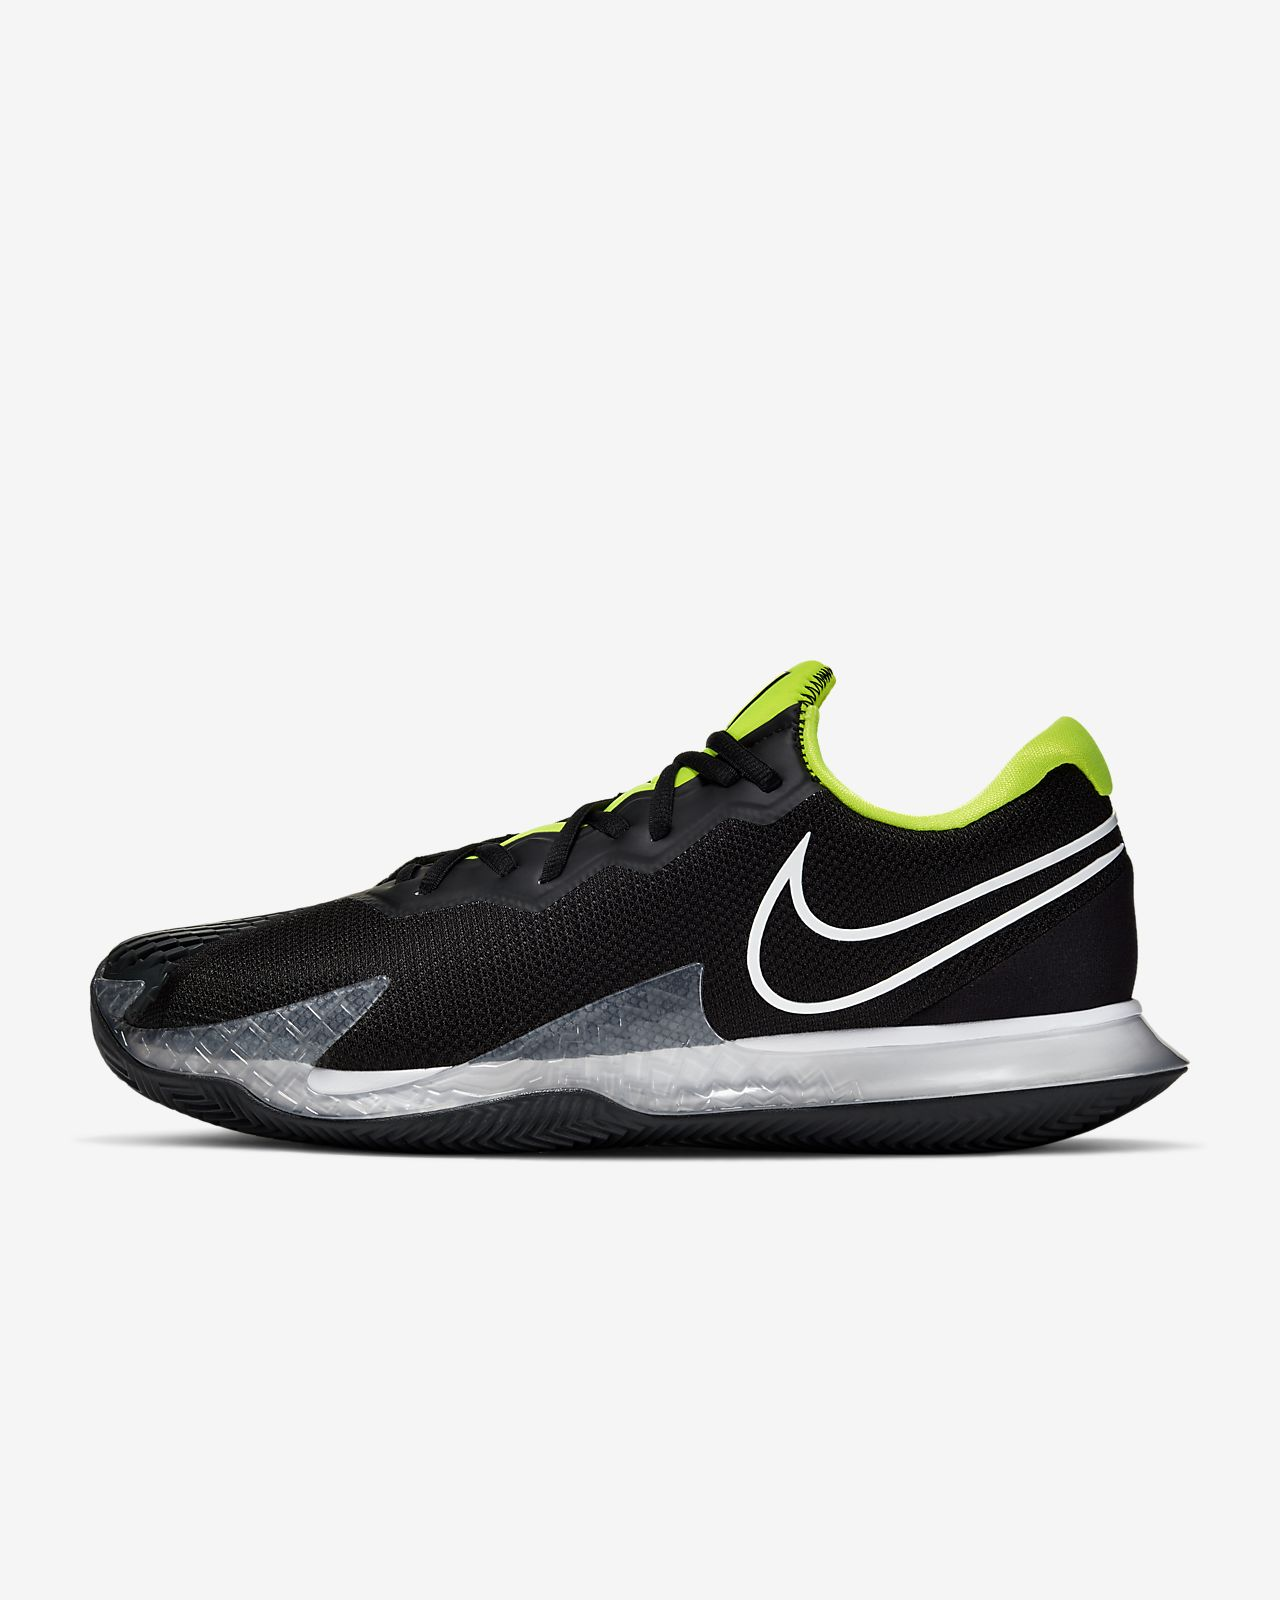 Nike Metcon 4 Men's Clay Green White Mica Green